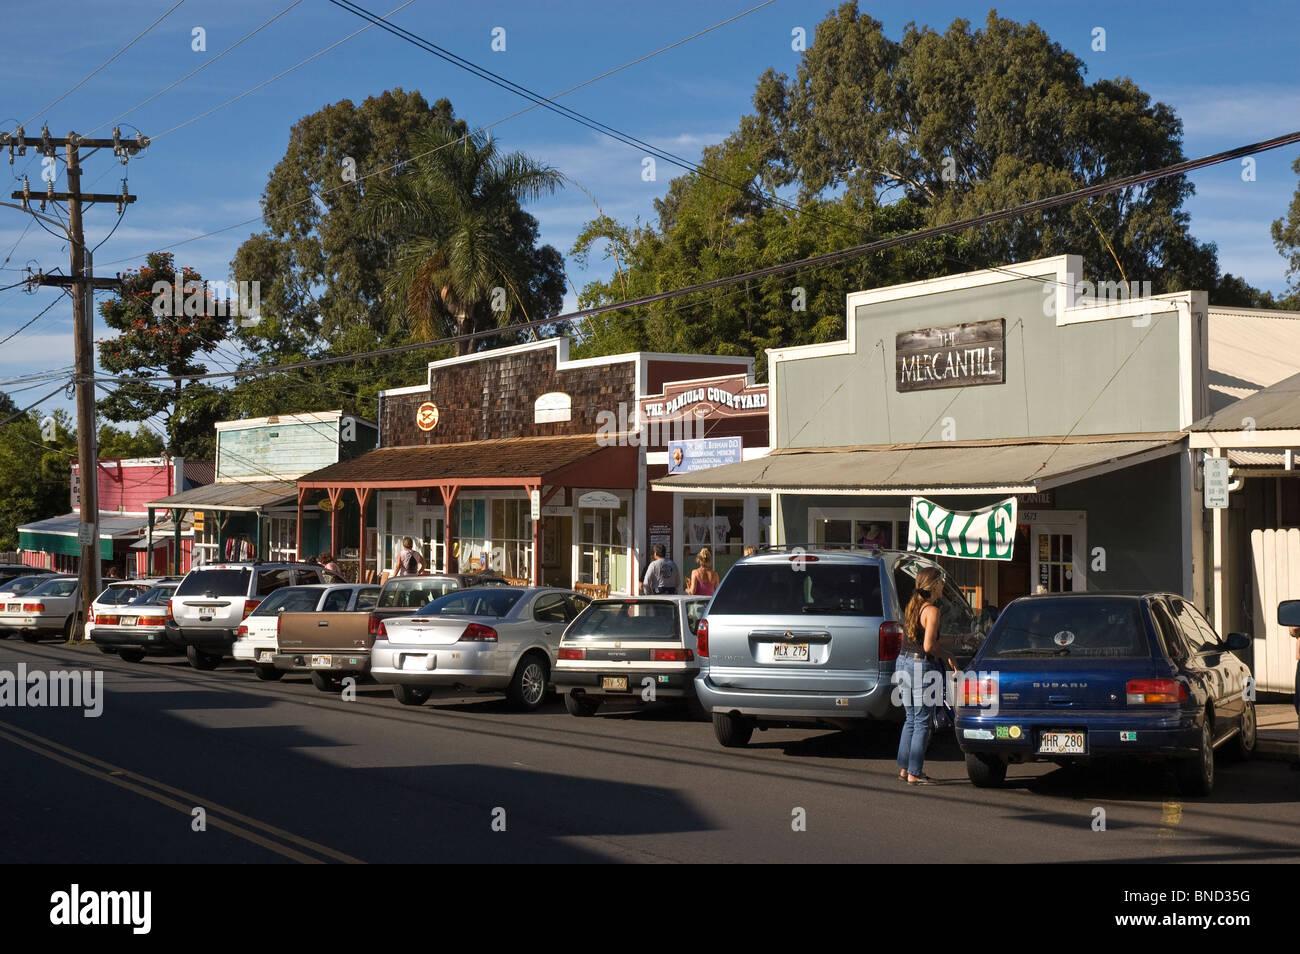 Elk284-4701 Hawaii, Maui, Upcountry, Makawao, town scene Stock Photo